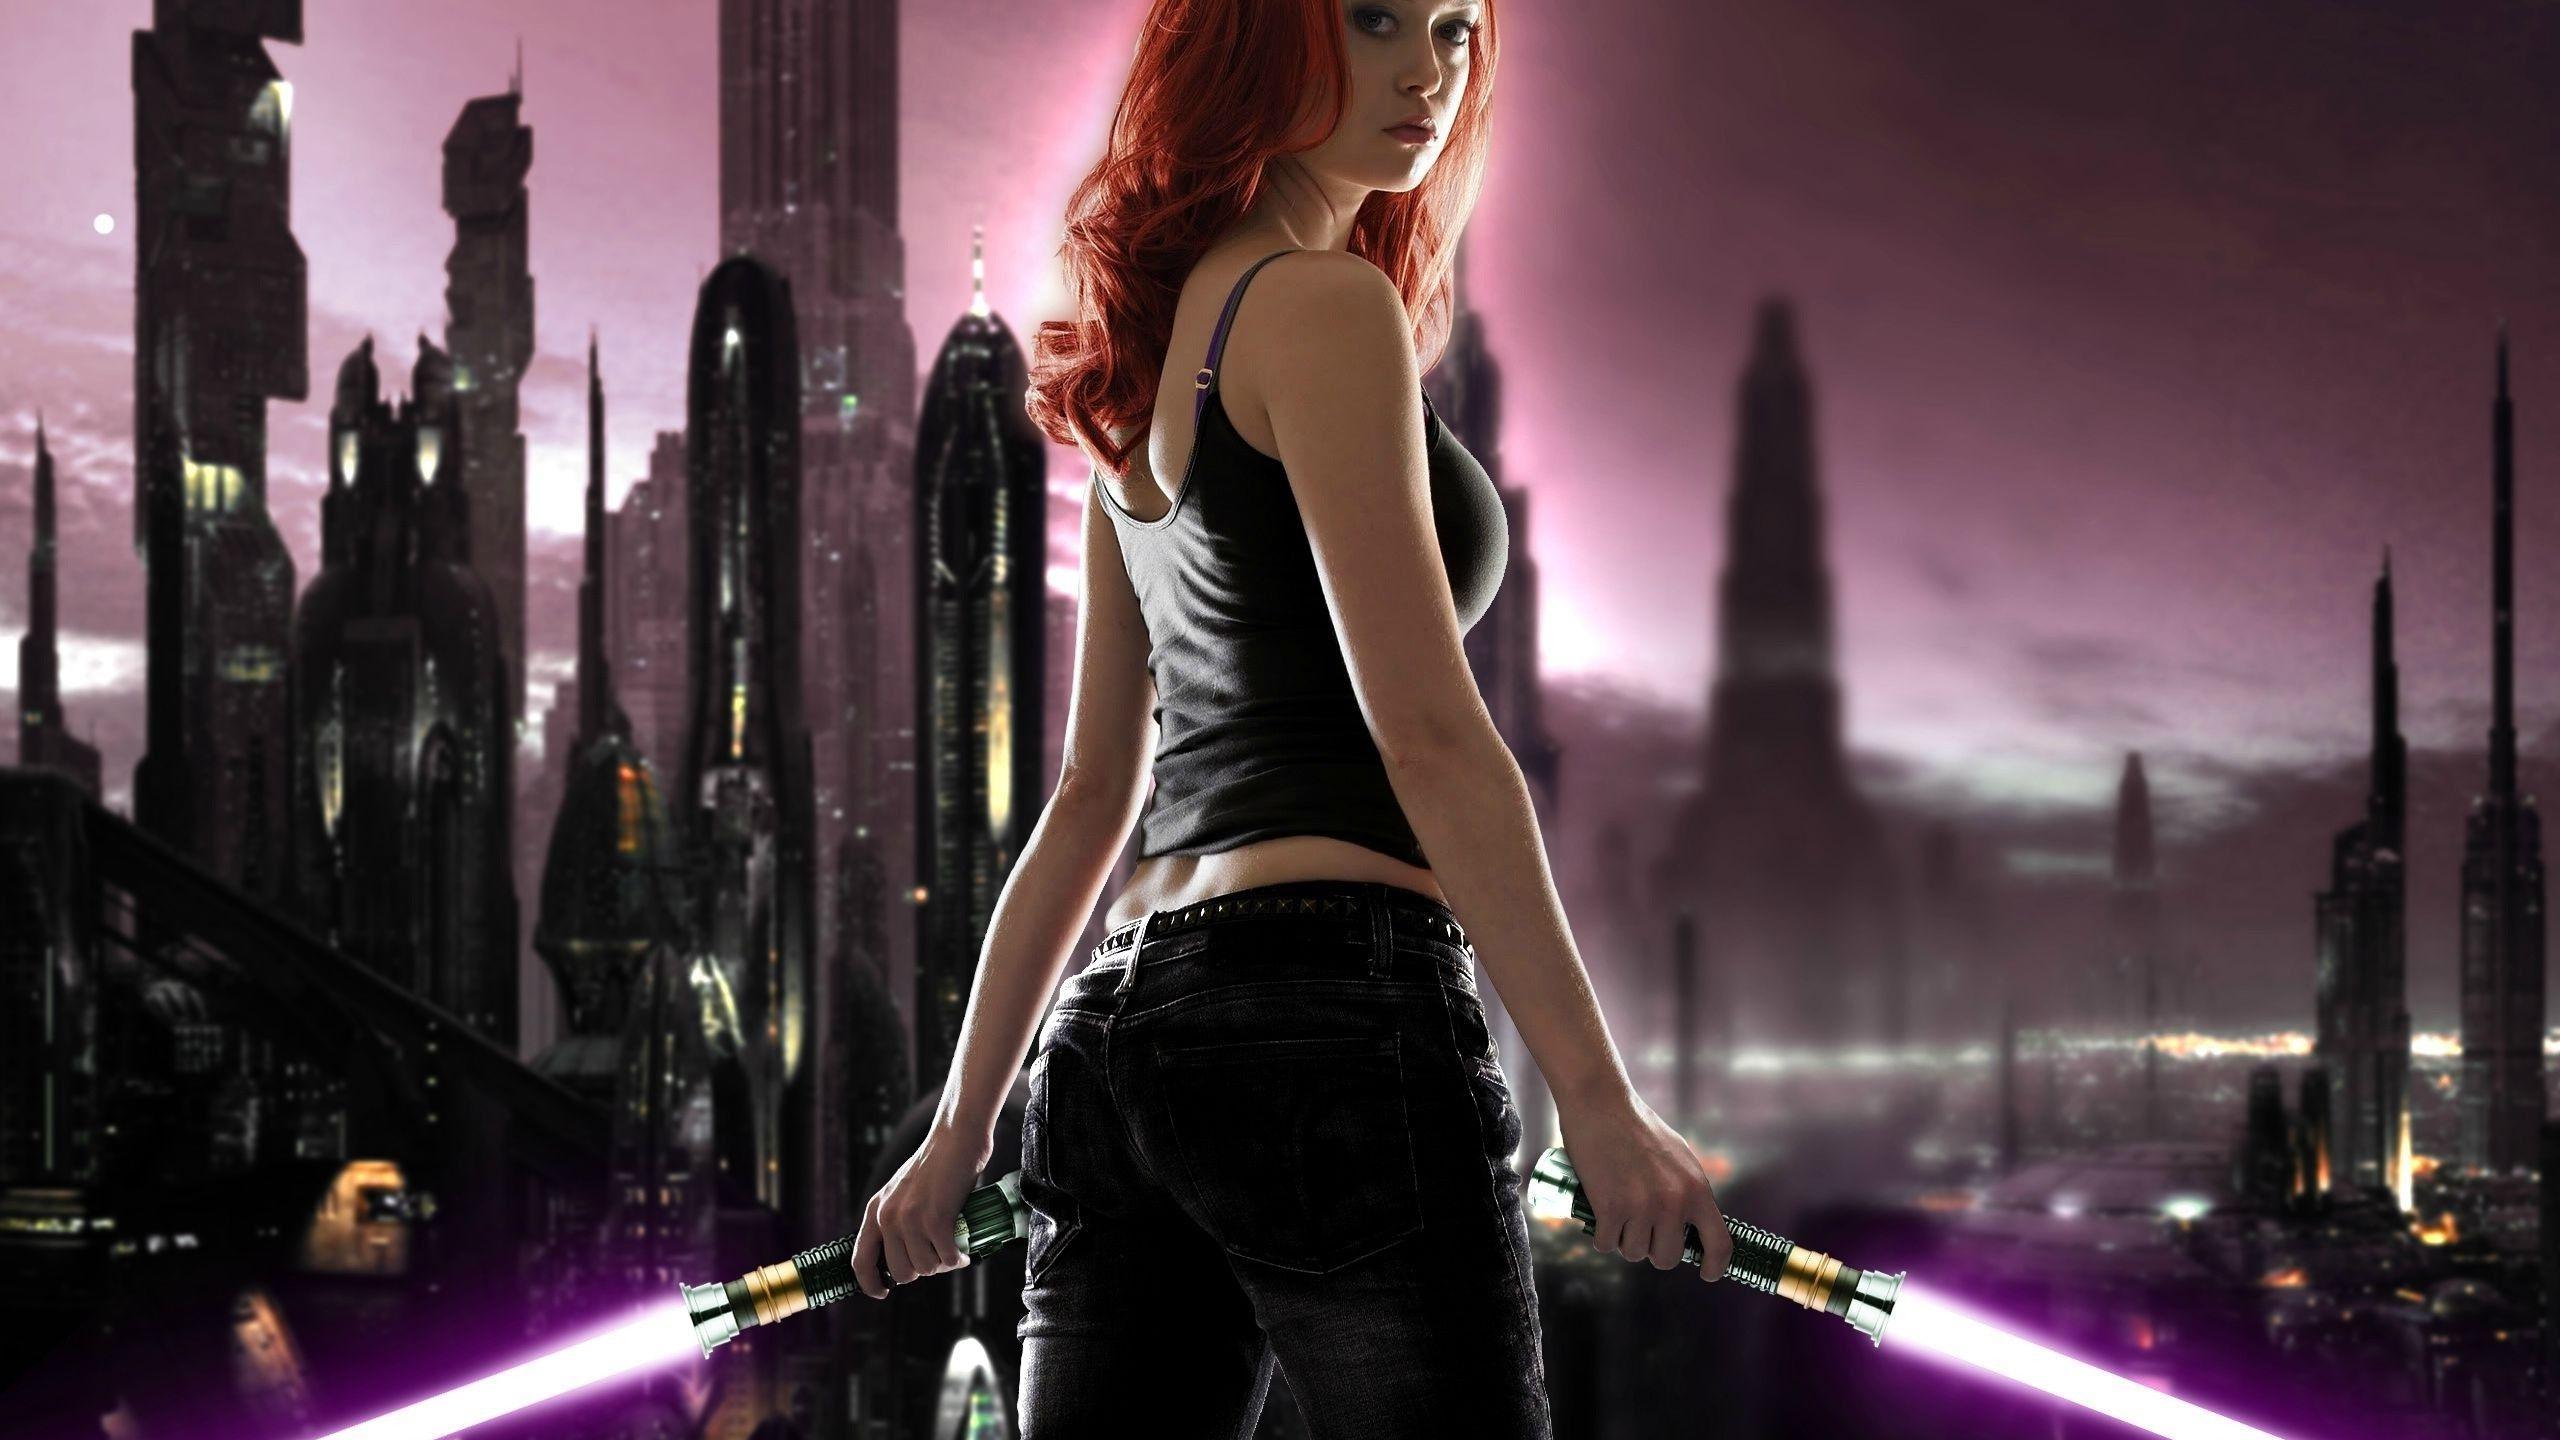 Star Wars Lightsaber Midnight Girl Darkness 2560x1440 Px Computer Wallpaper